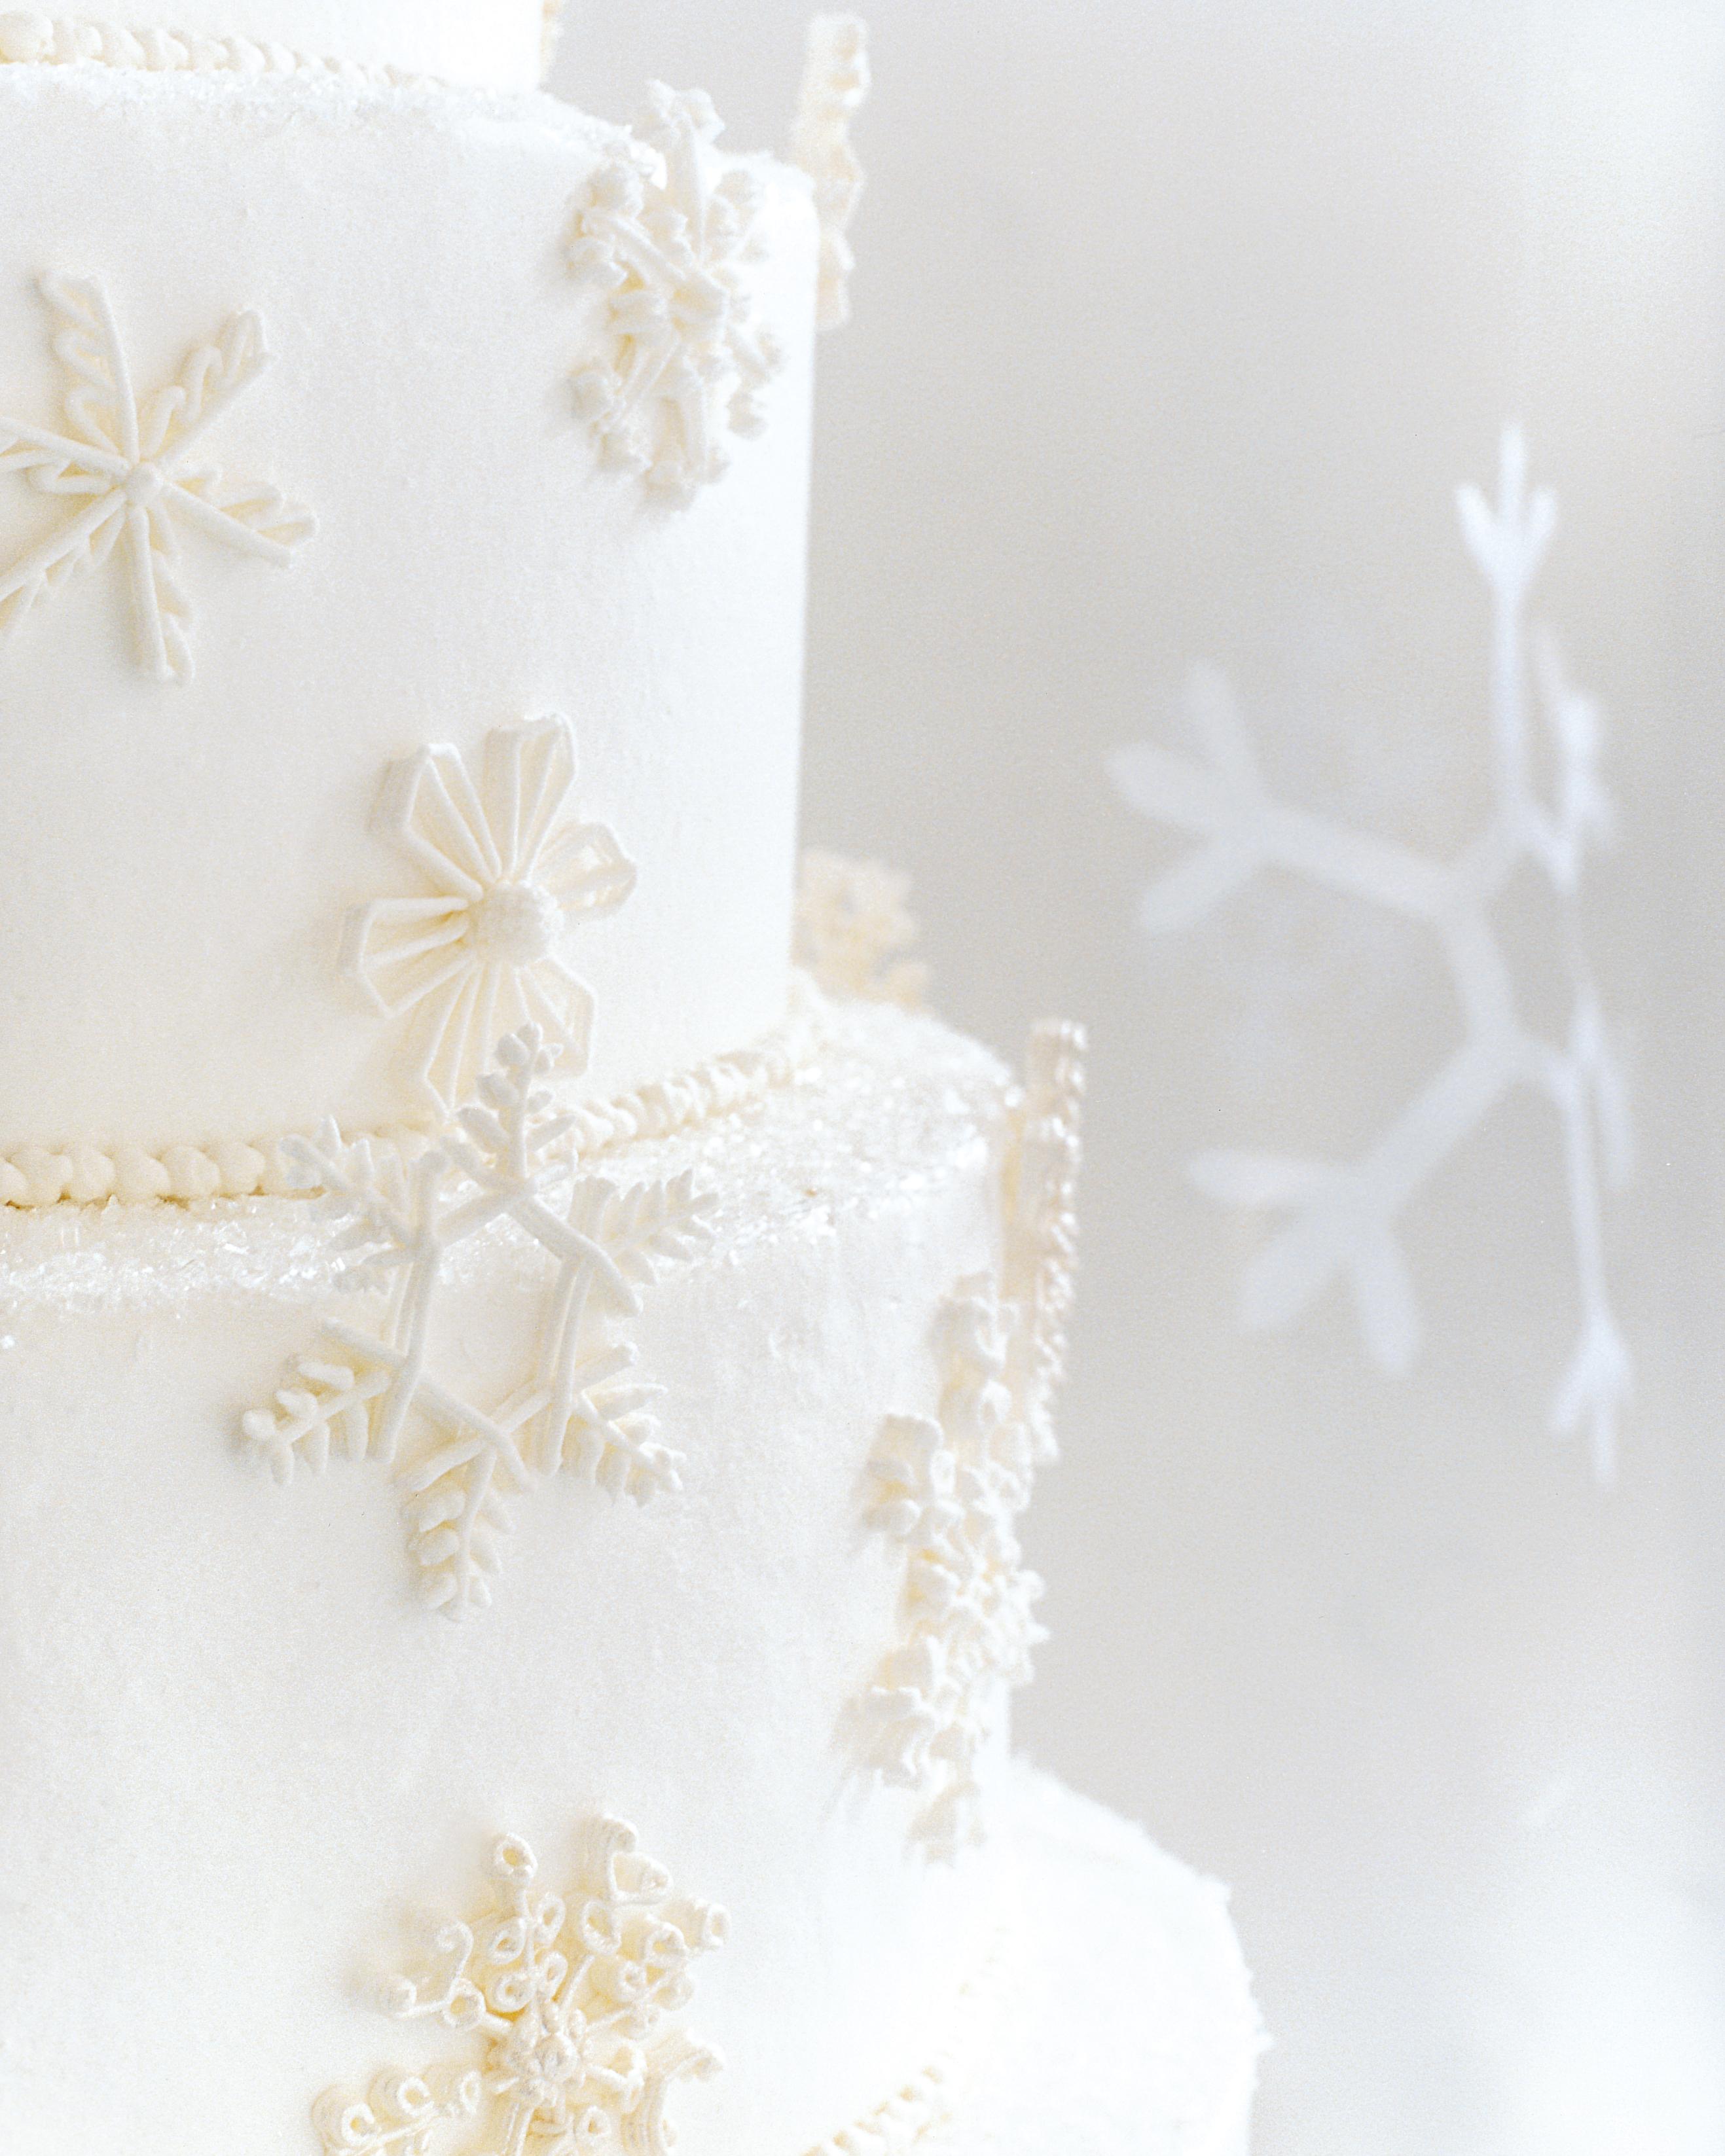 diy-winter-wedding-ideas-snowflake-cake-decoration-1114.jpg